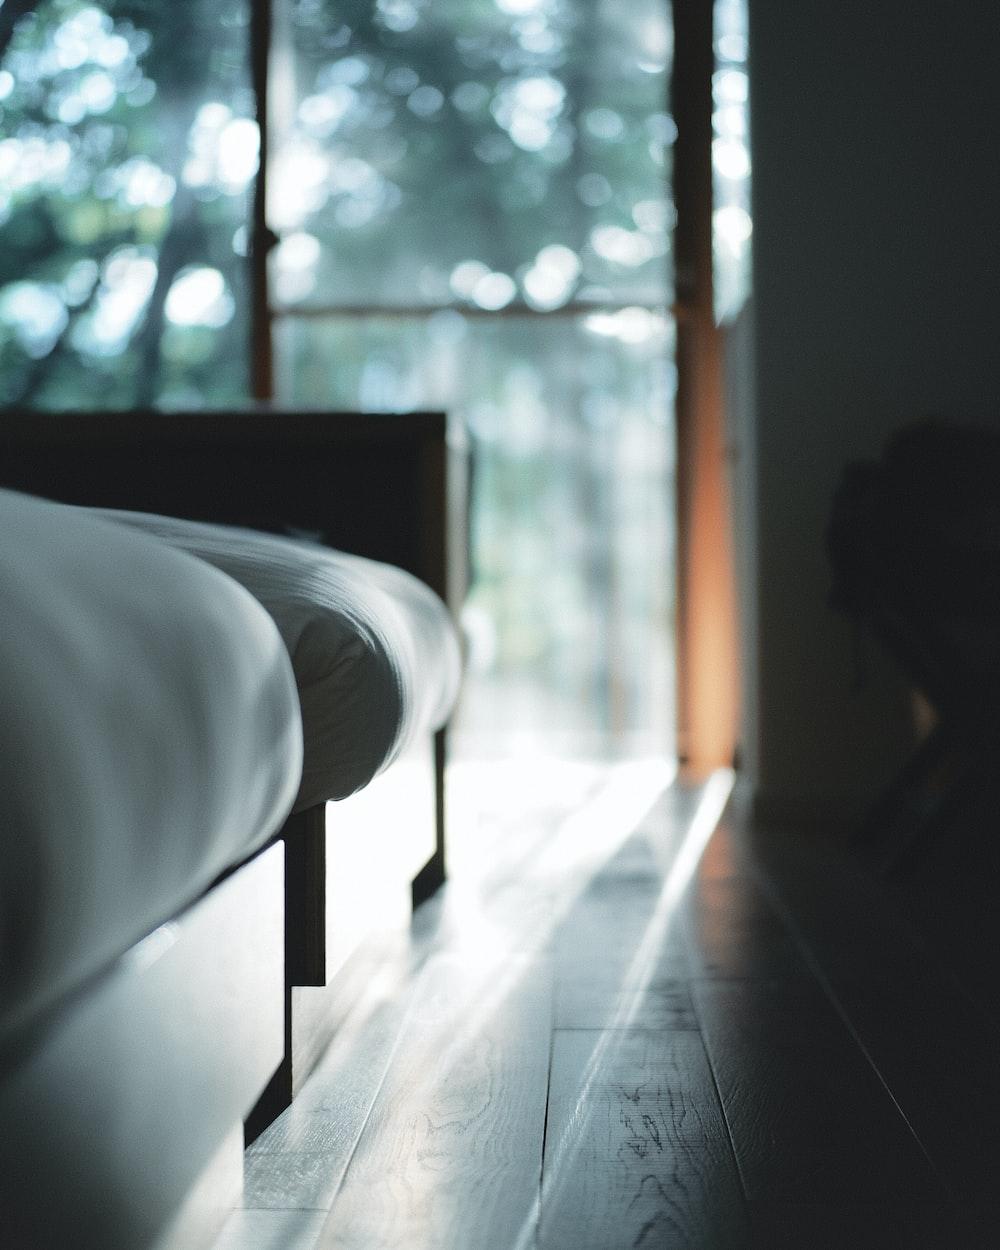 white bed near glass window